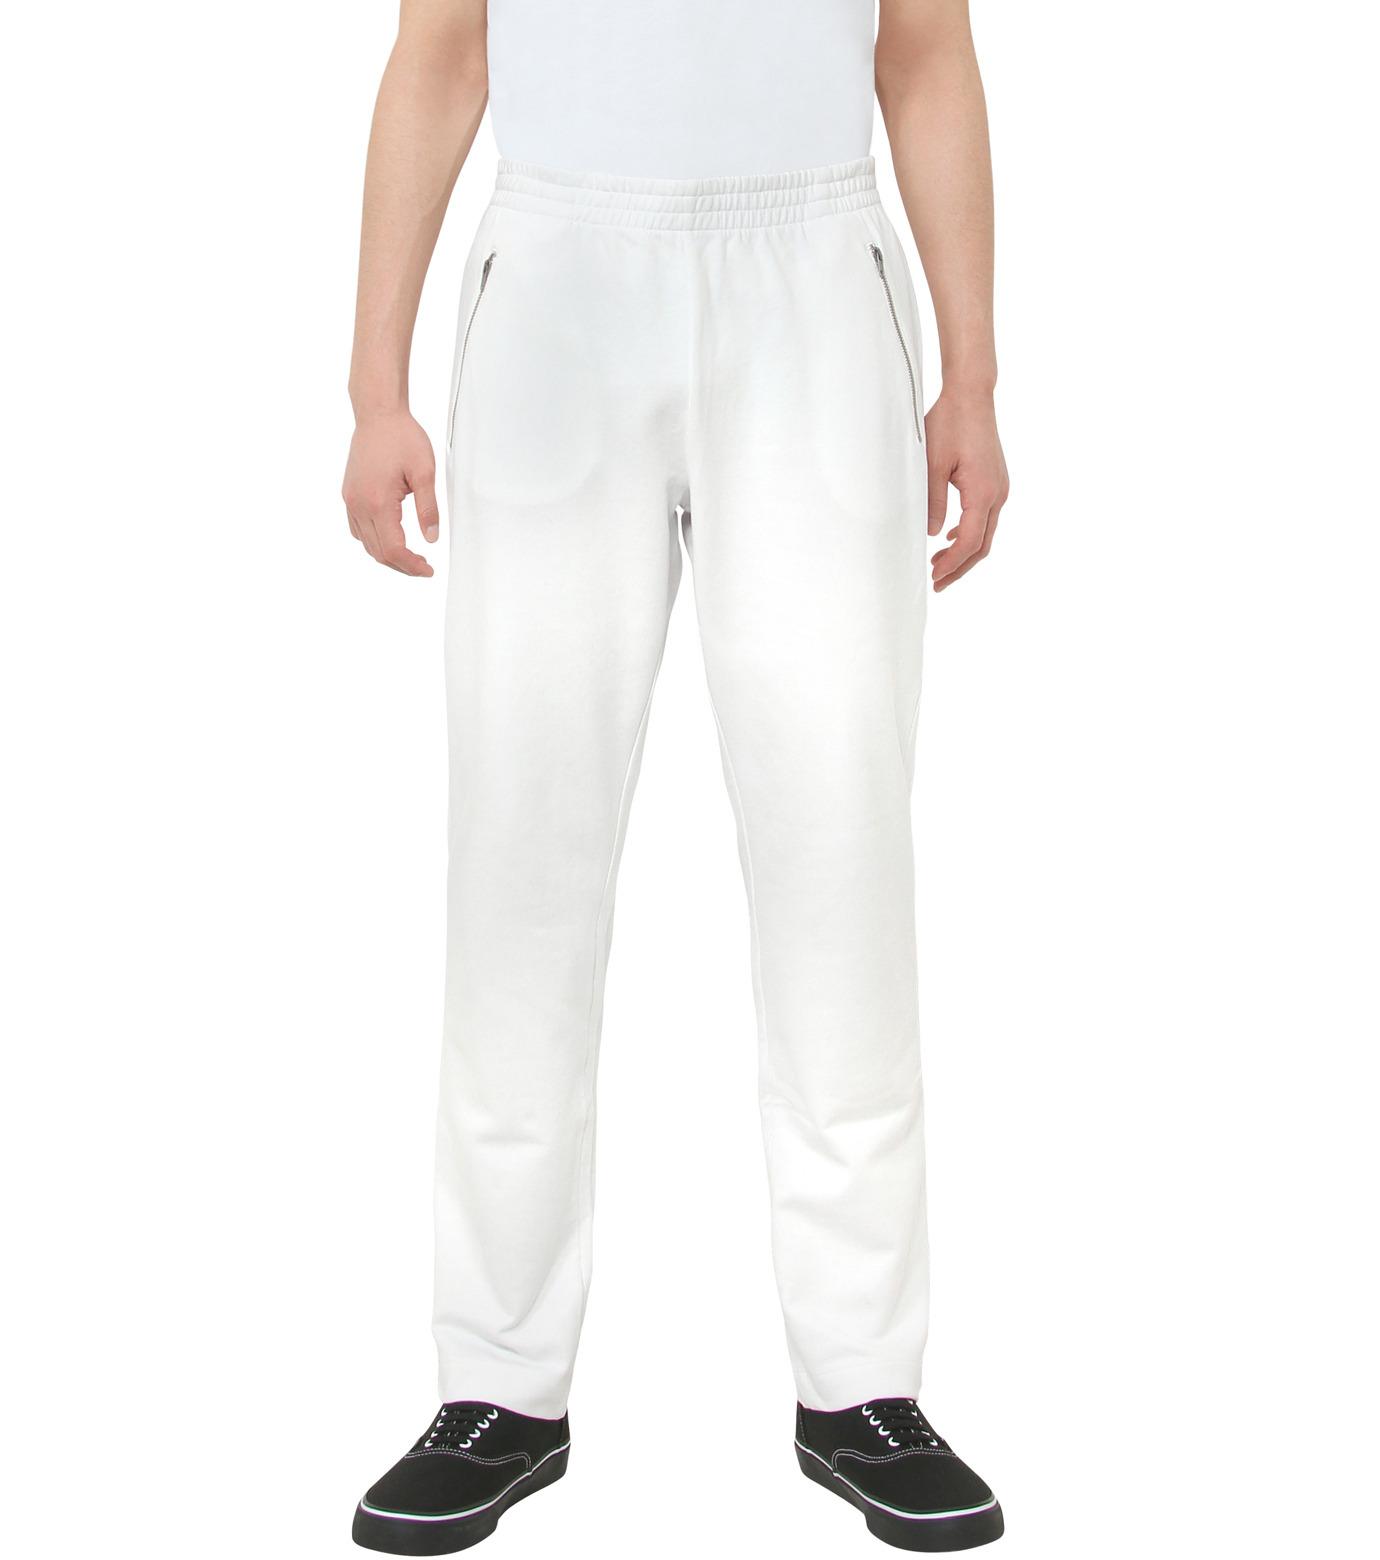 Gosha Rubchinskiy(ゴーシャ・ラブチンスキー)のCOTTON SWEATPANT ZIP DETAIL-WHITE(パンツ/pants)-G008P007-4 拡大詳細画像1